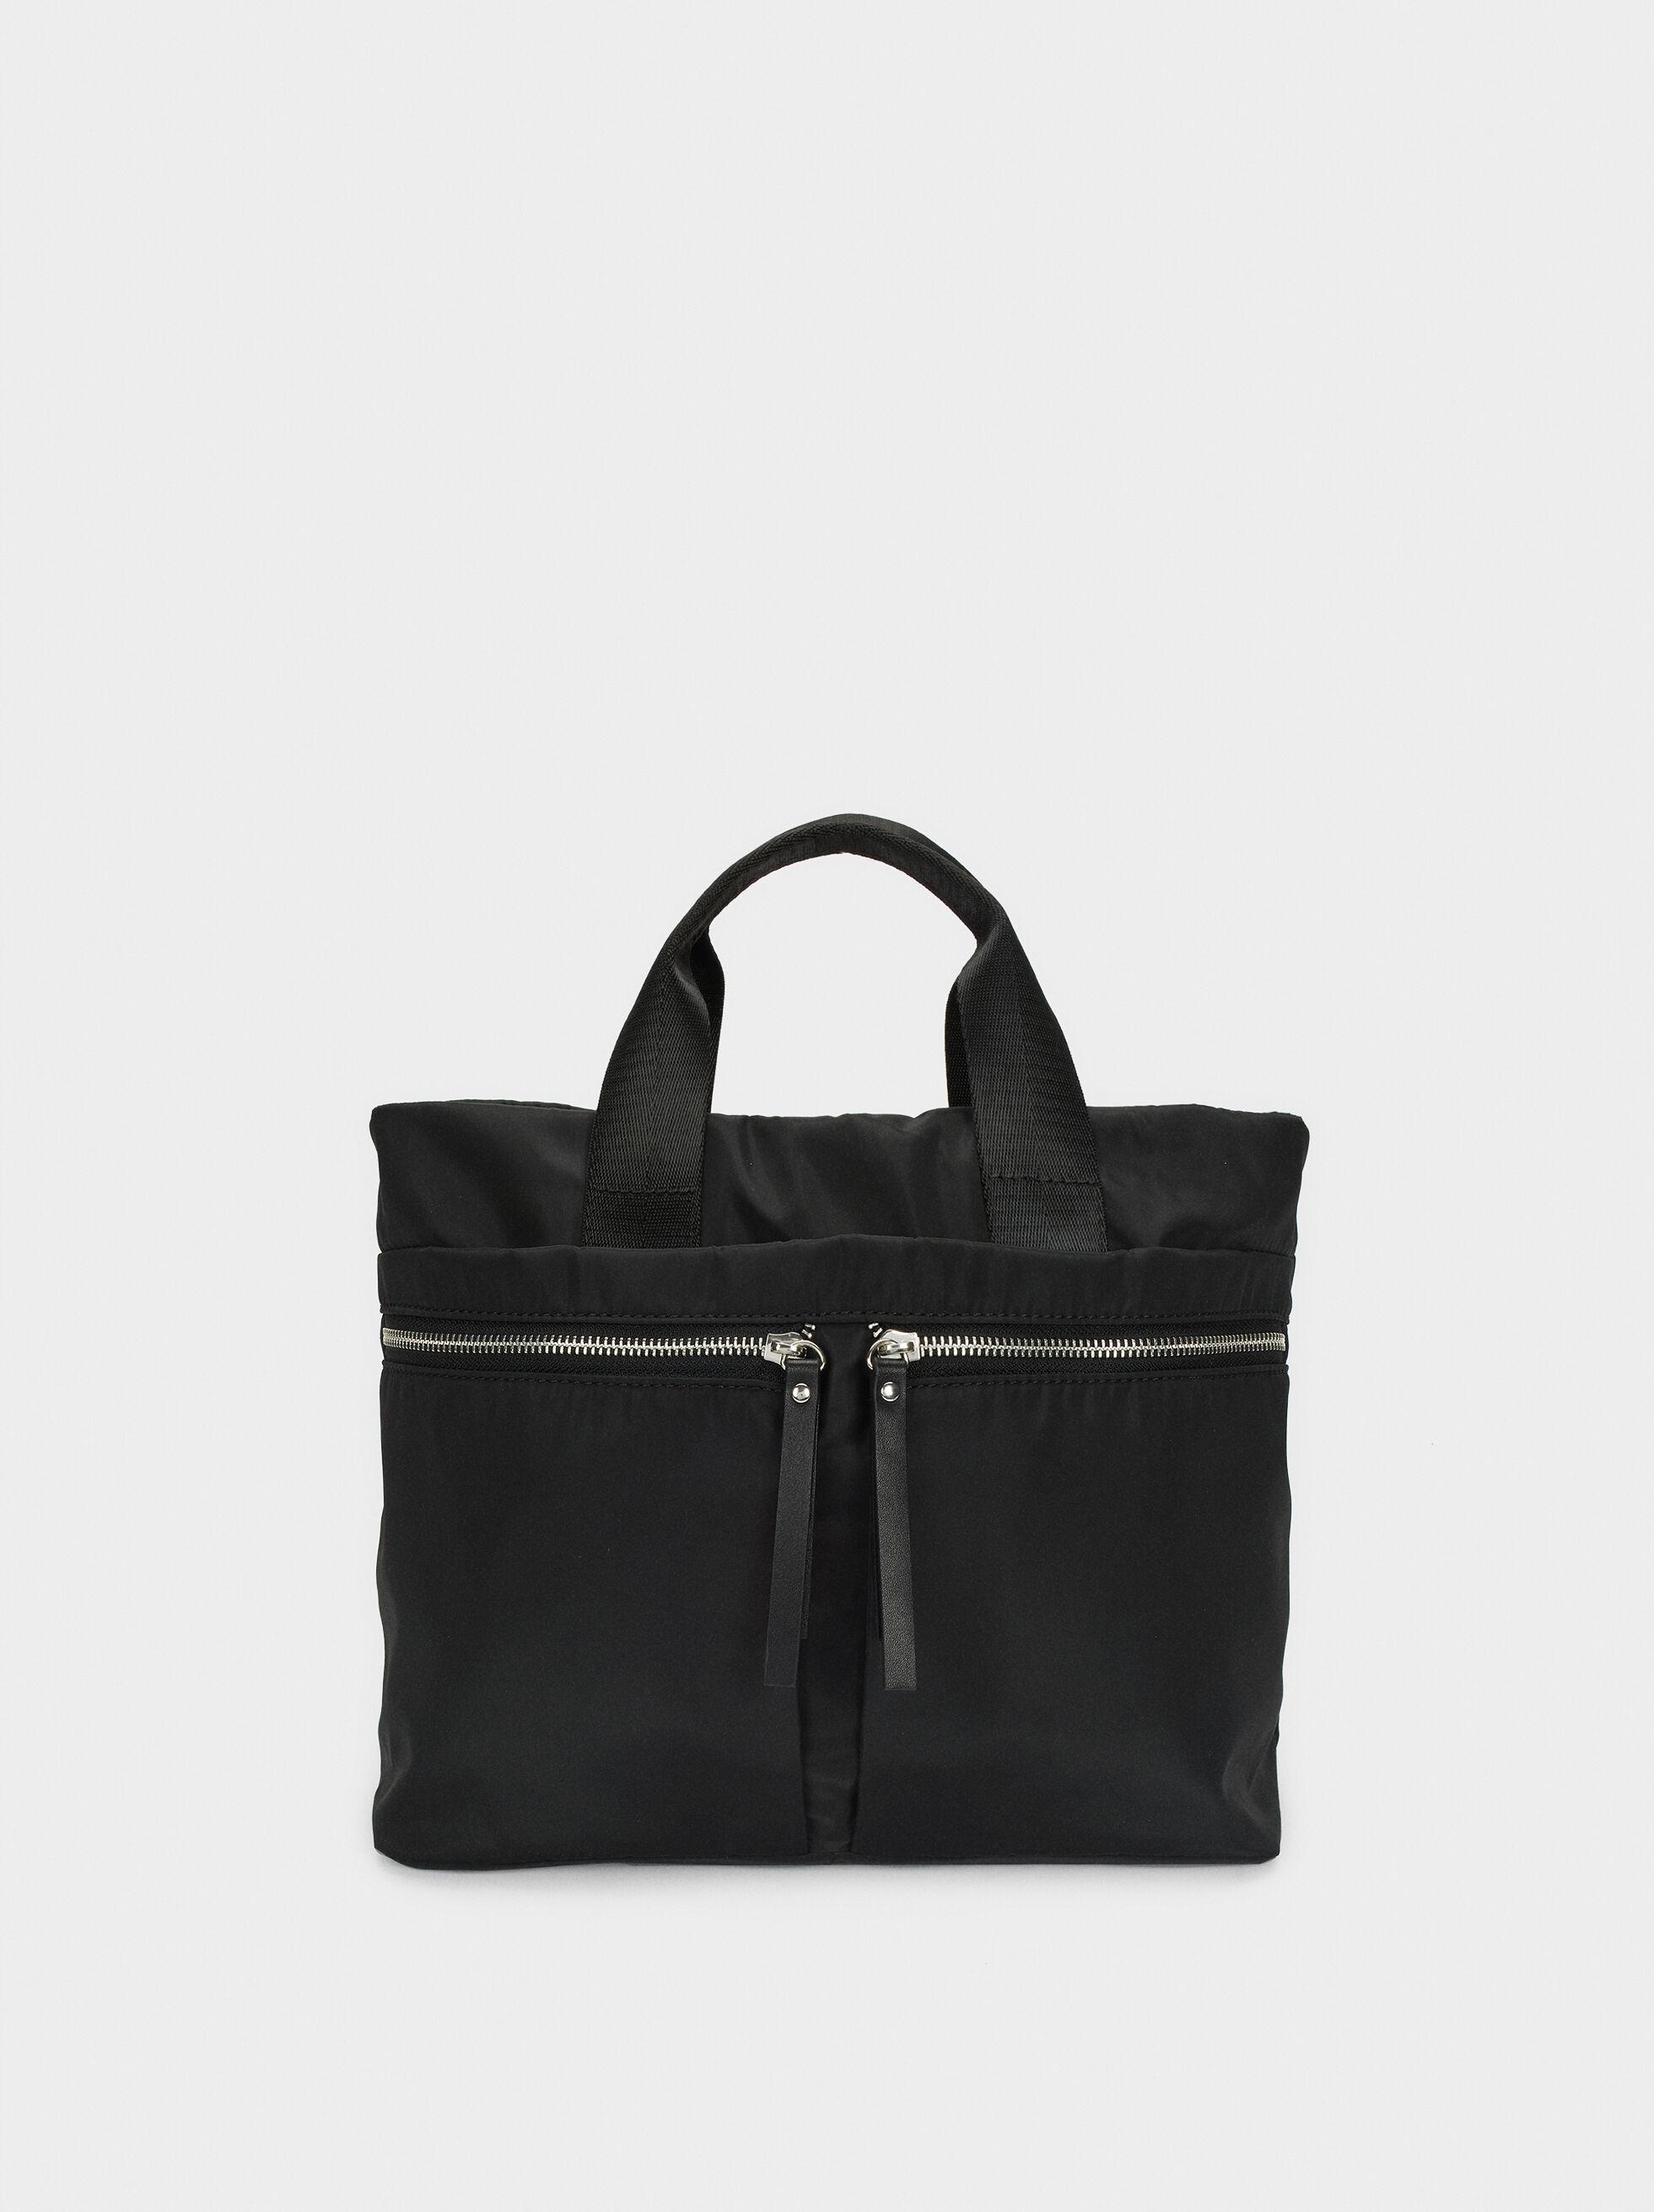 Nylon Tote Bag With Pockets, , hi-res